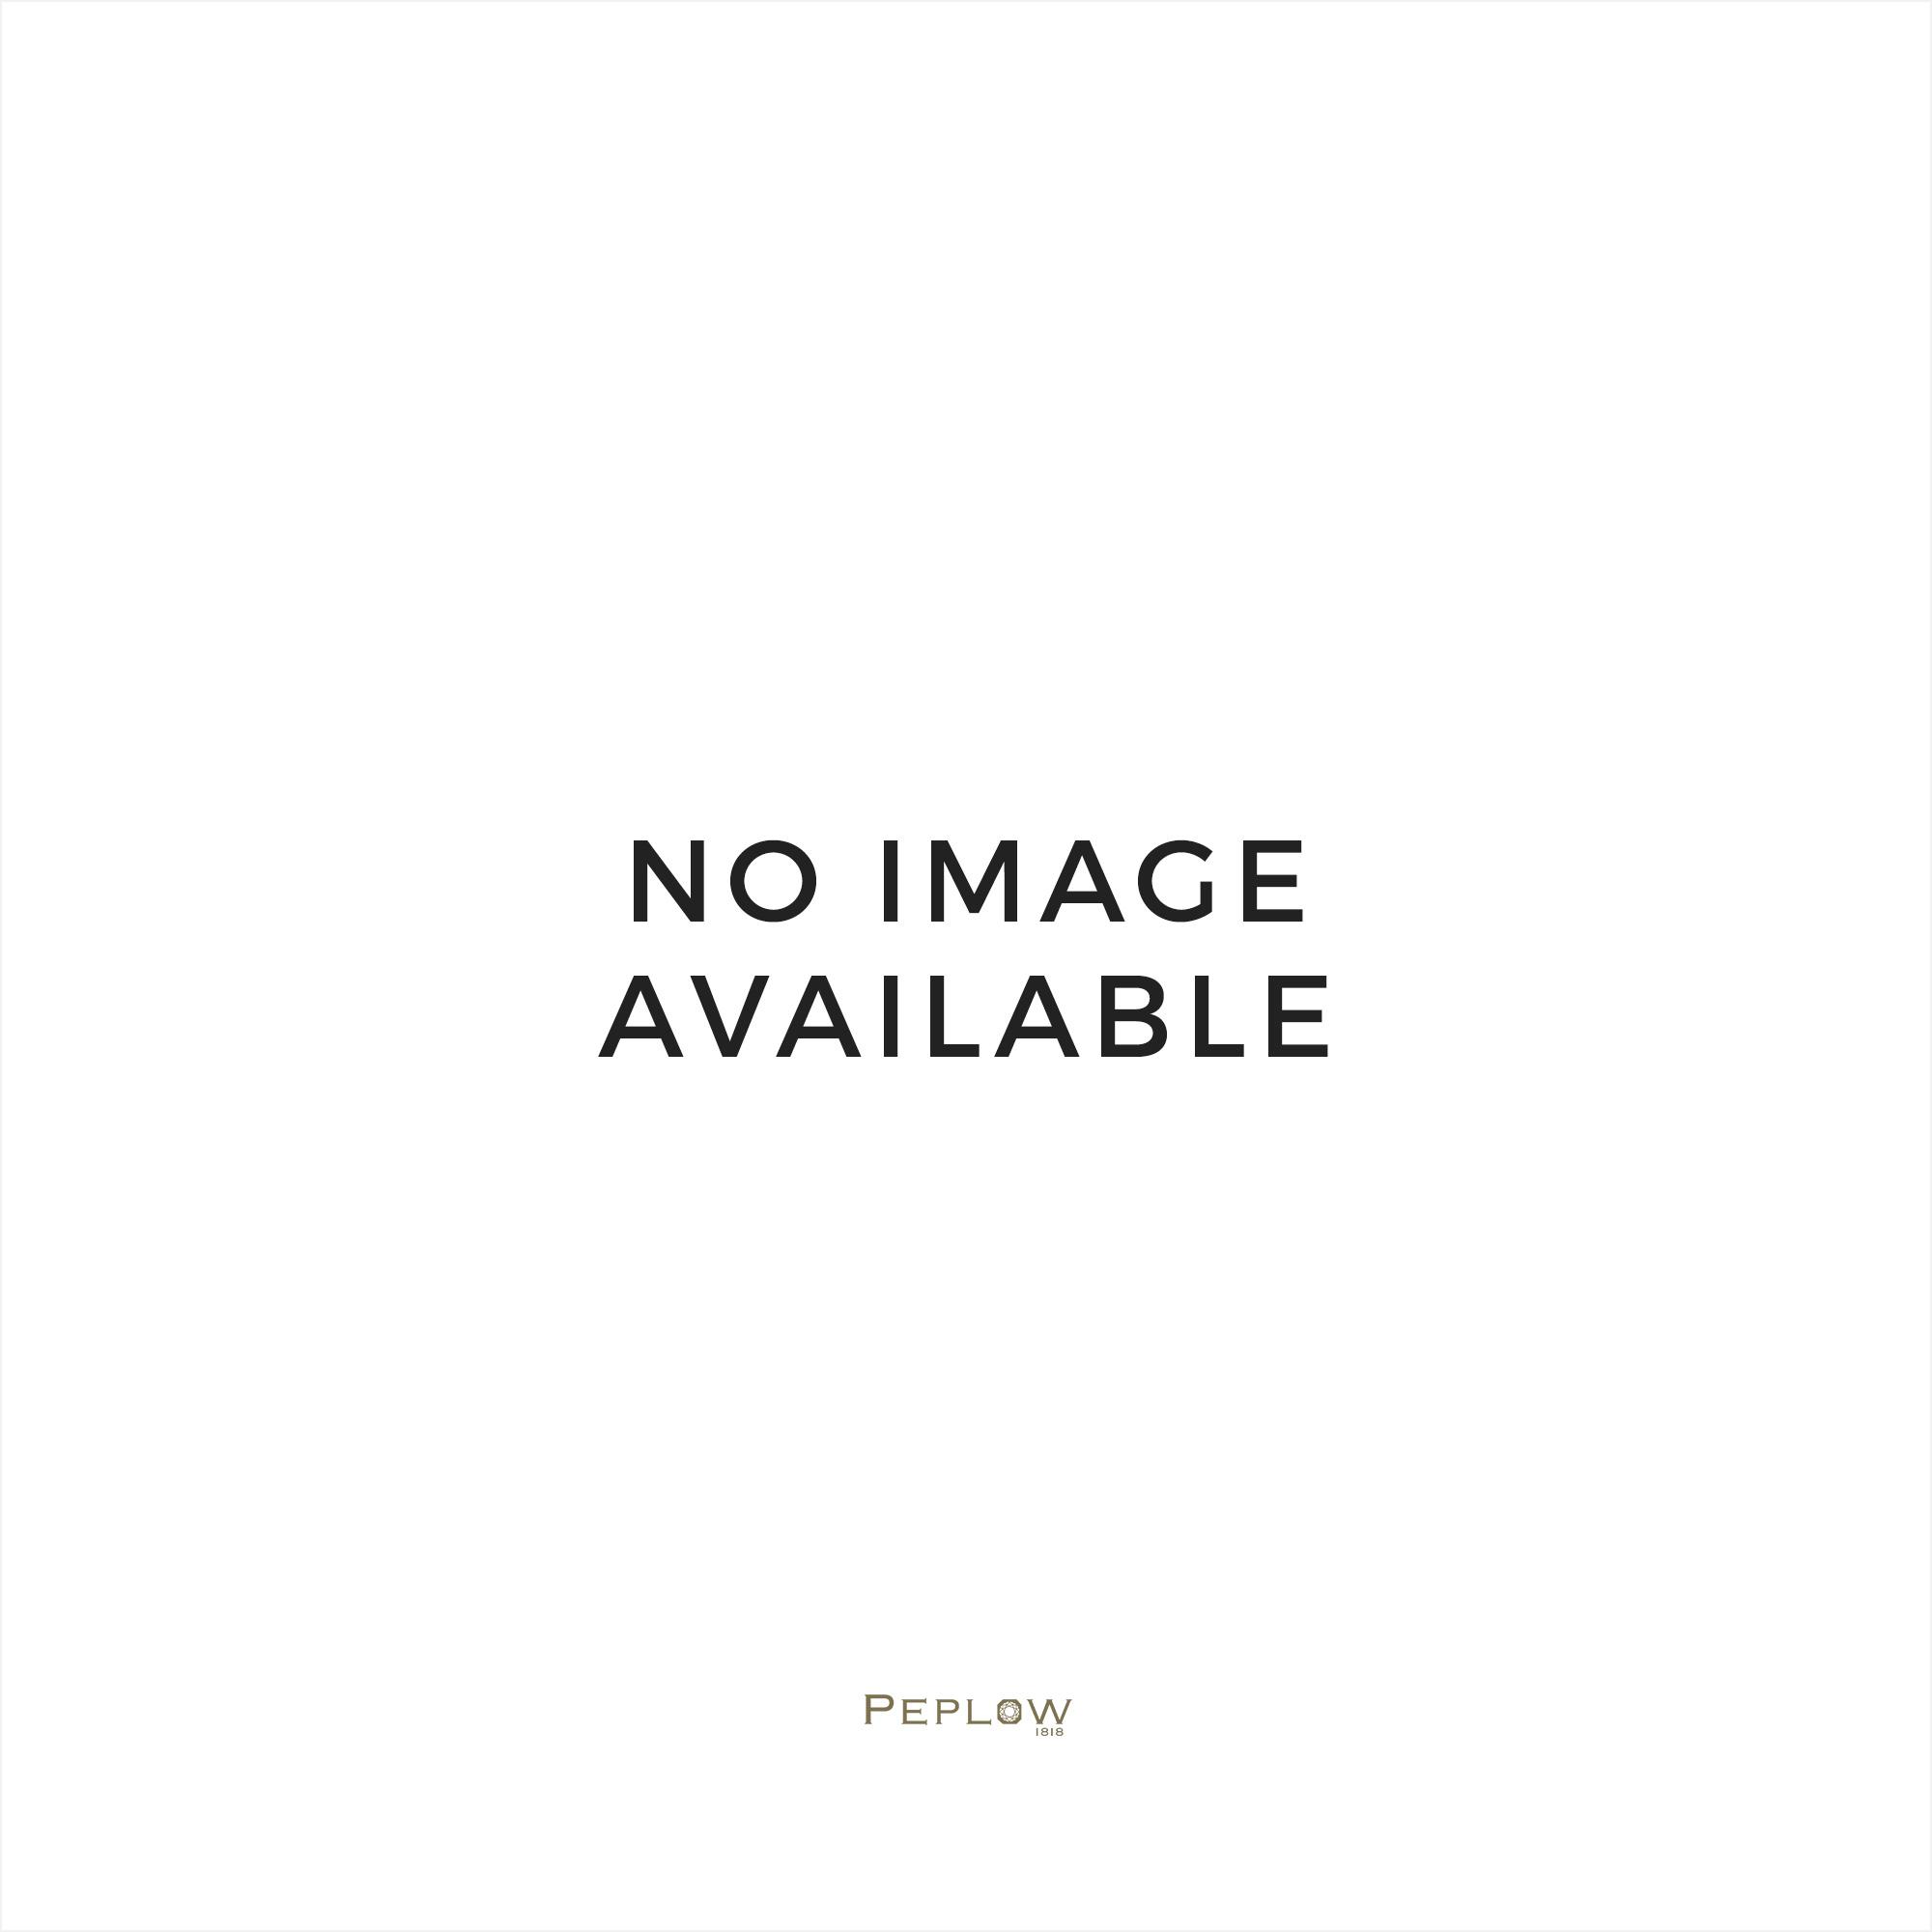 Citizen Watches mens stainless steel quartz watch bracelet BI5000-52A